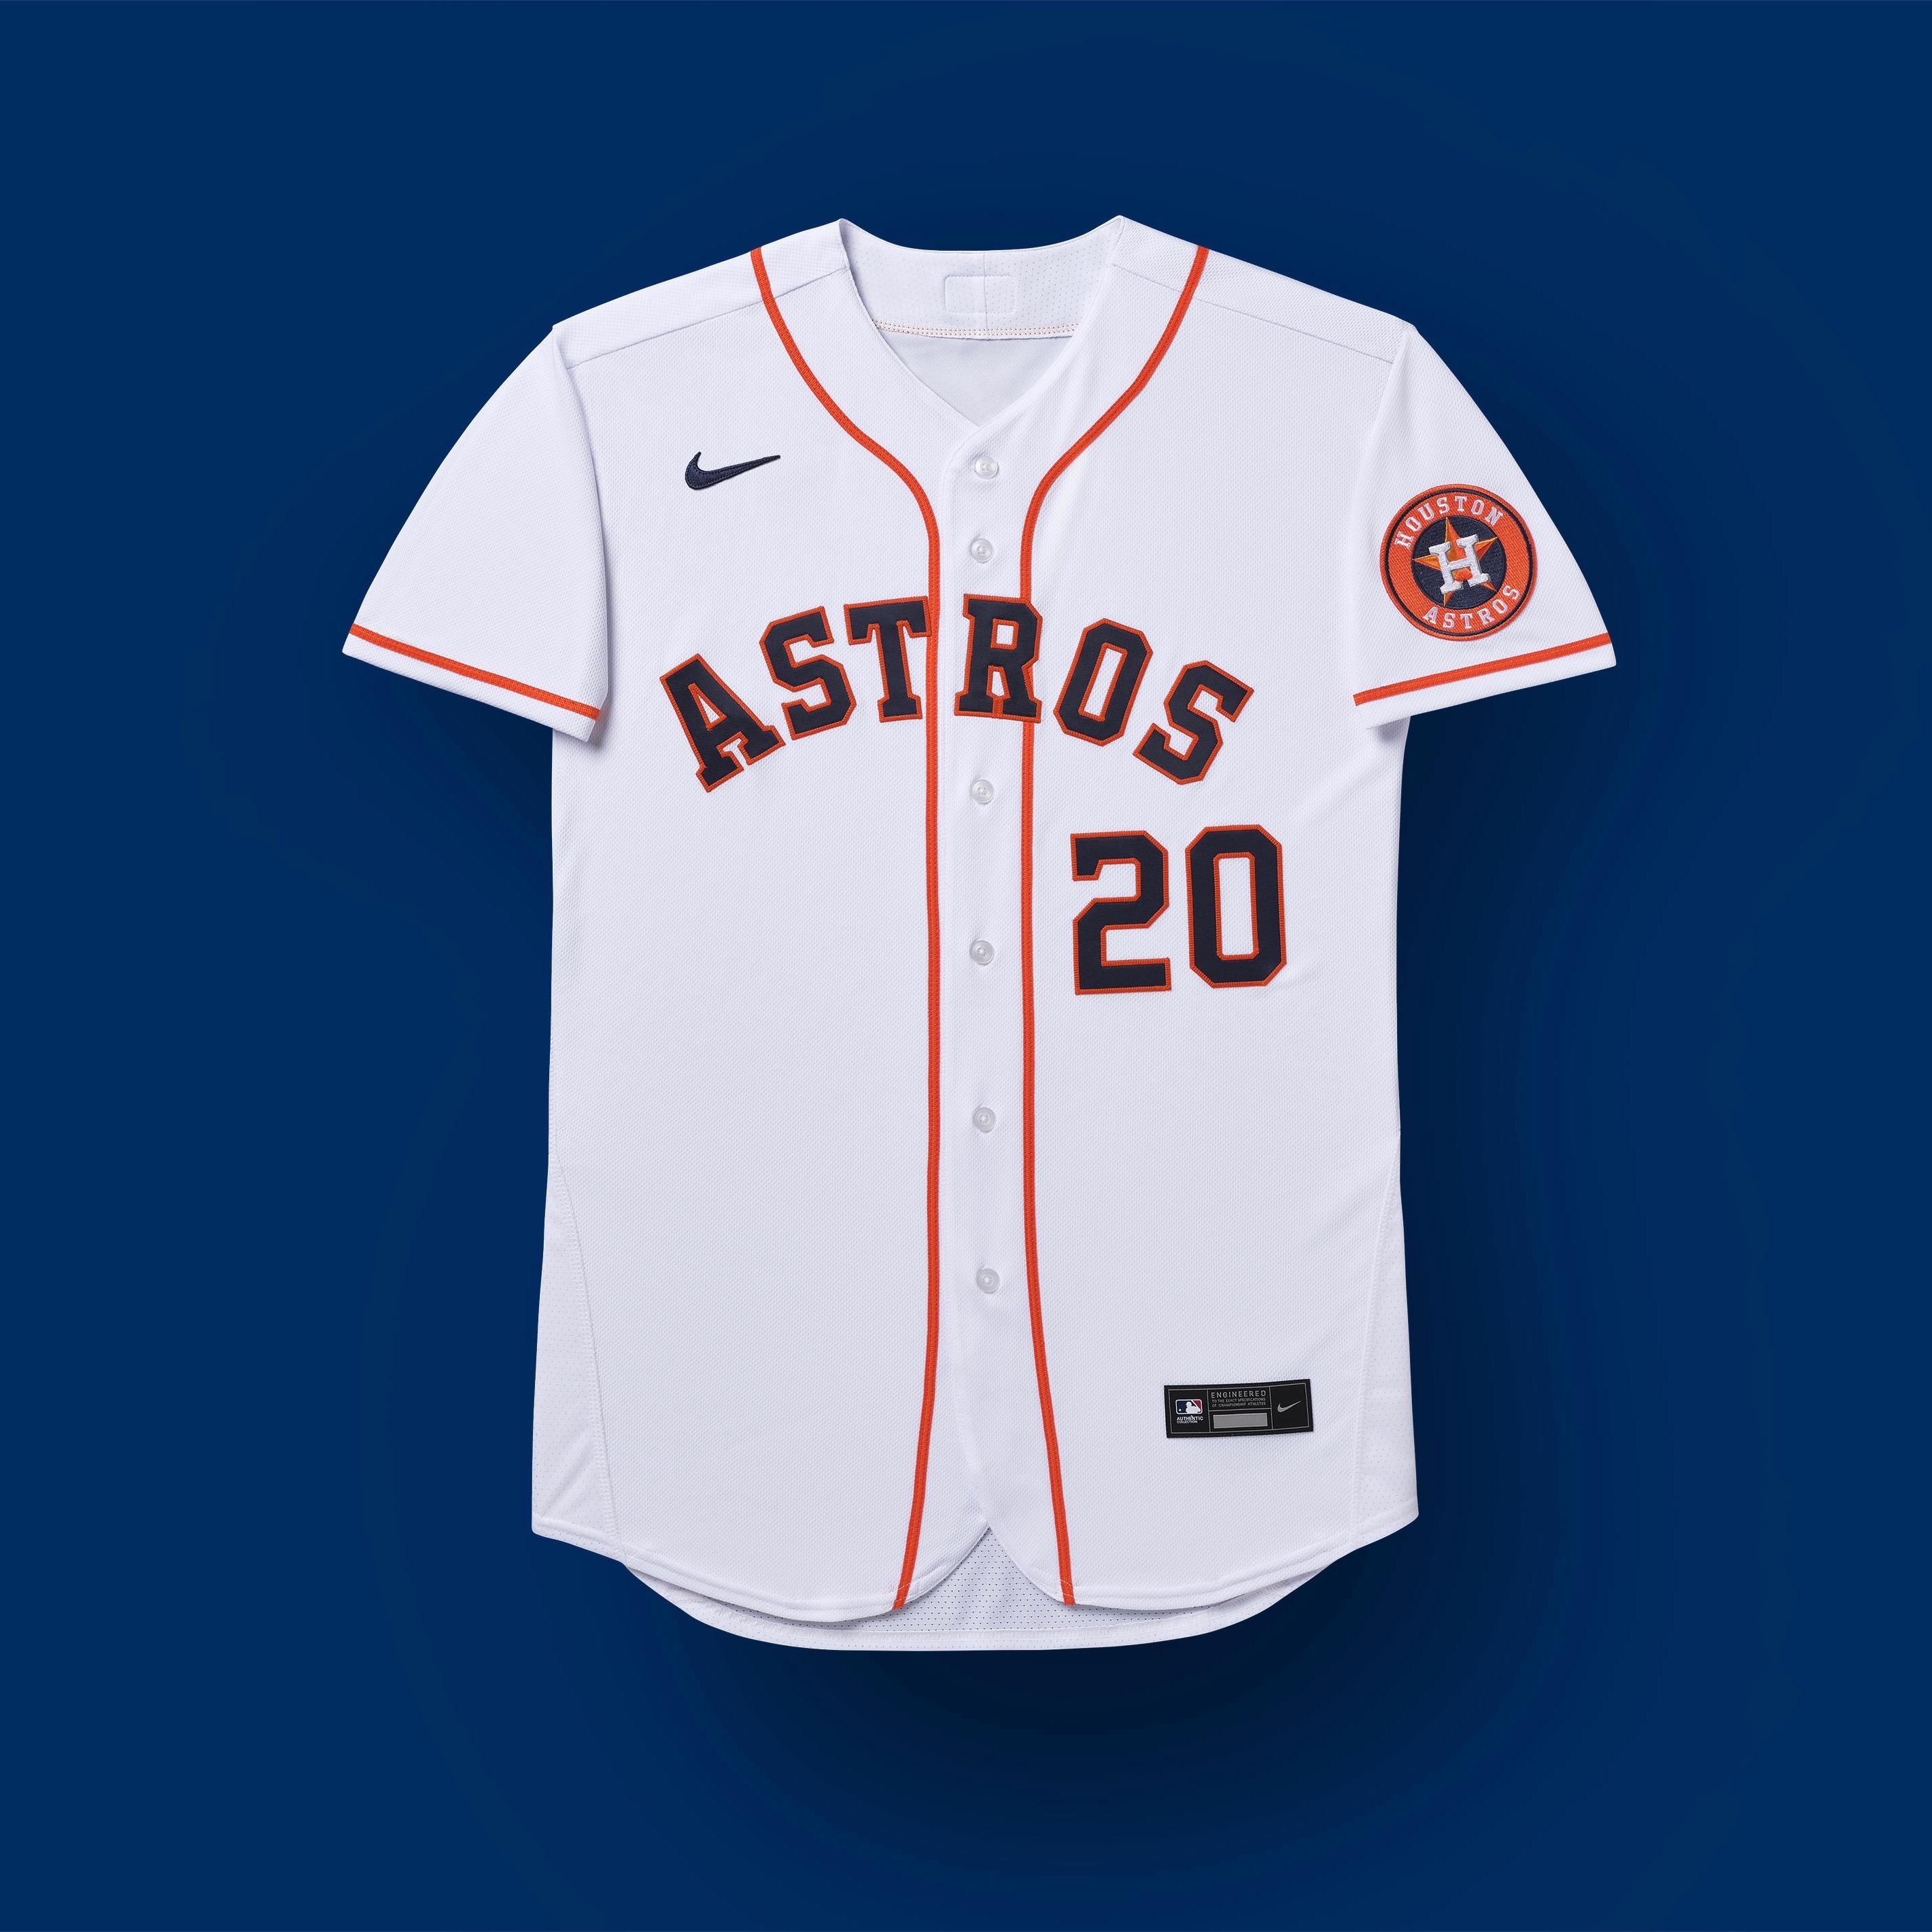 Houston Astros 2020 uniformes